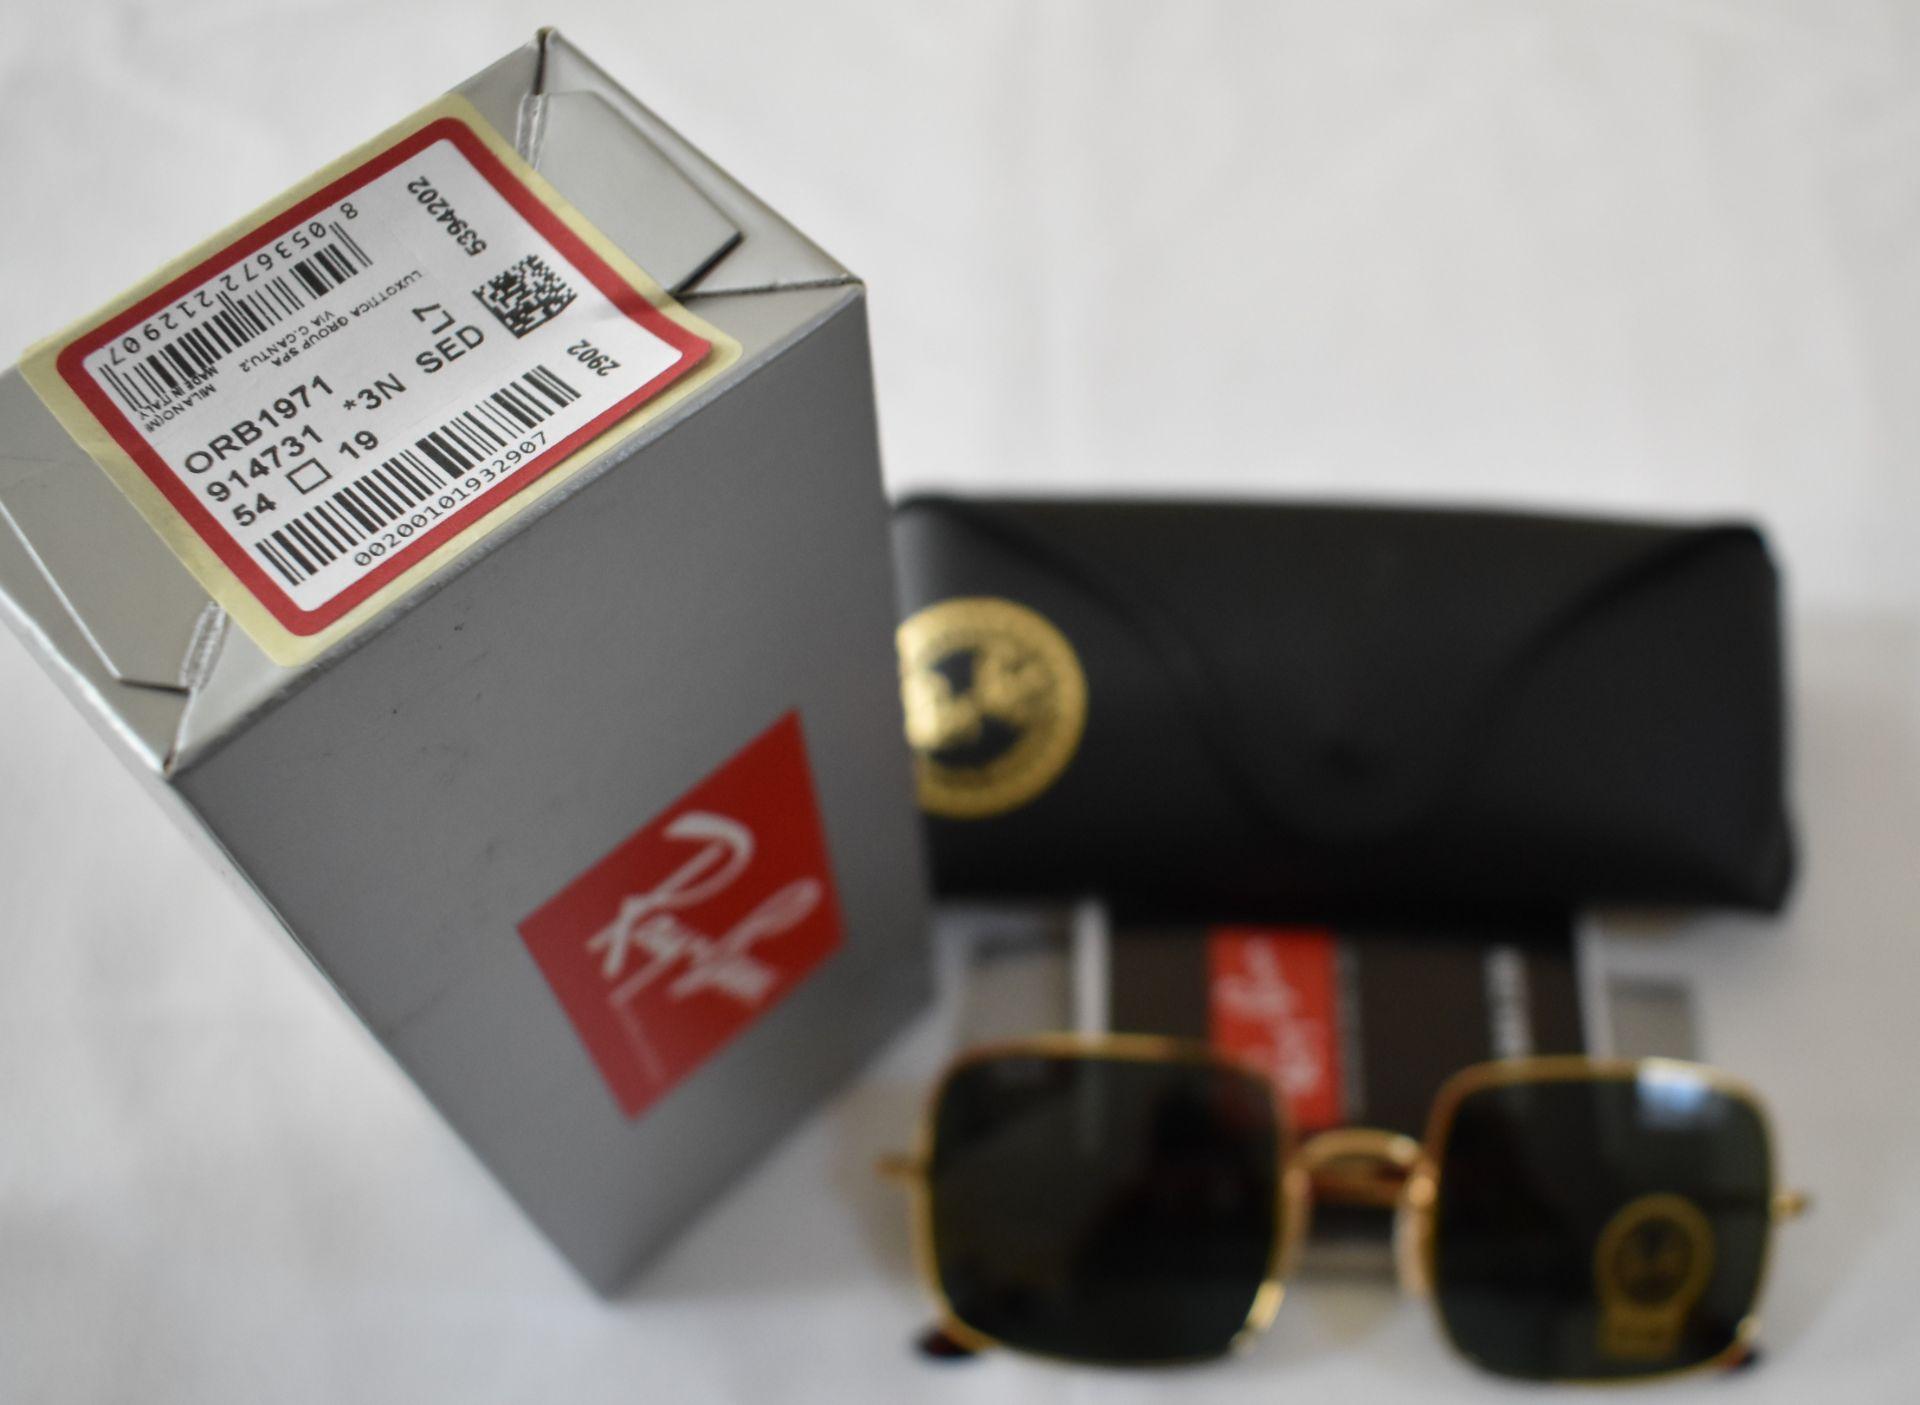 Ray Ban Sunglasses ORB1971 914731 *3N - Image 2 of 2